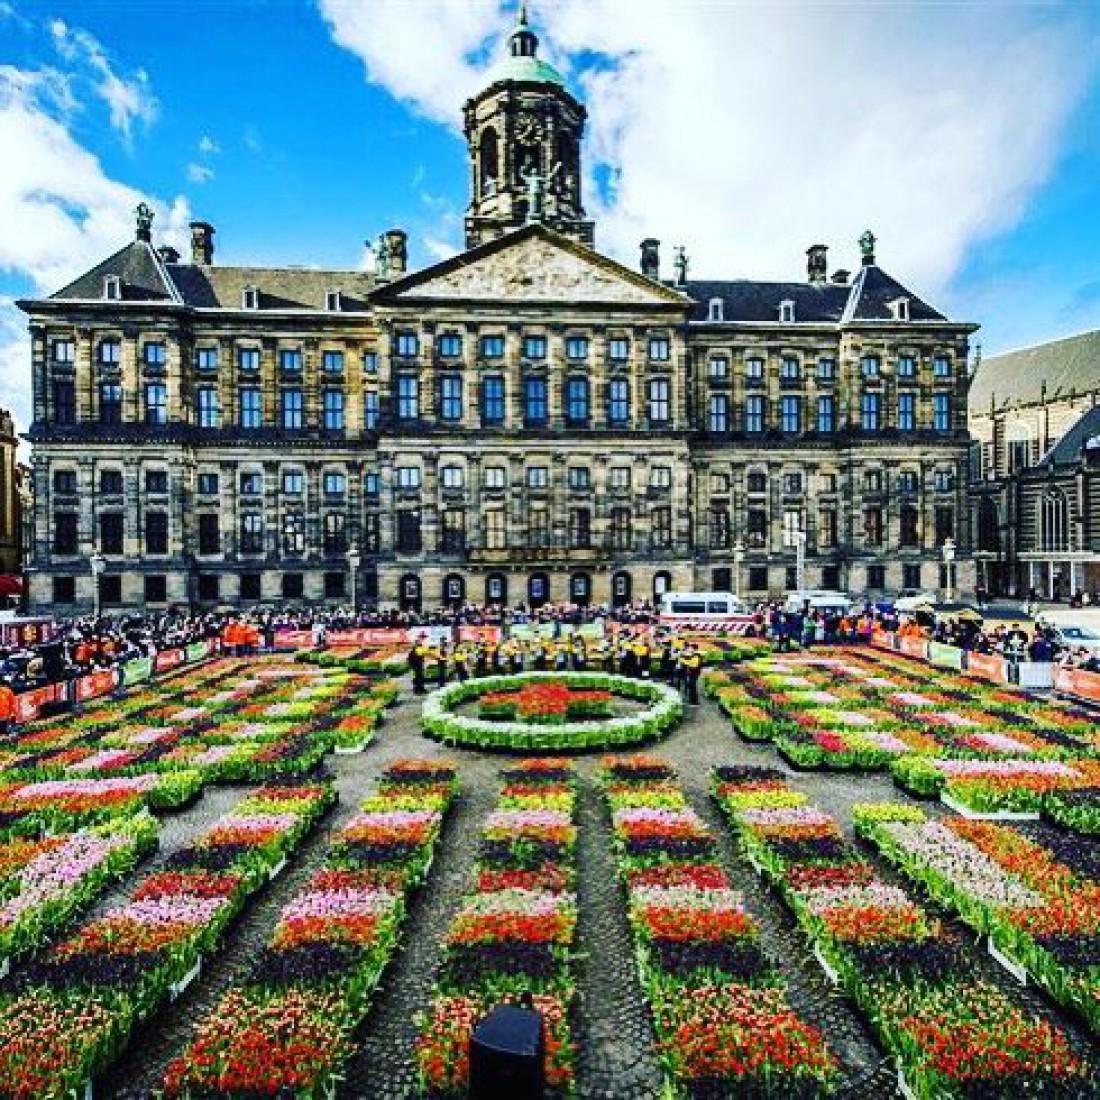 Королевский дворец - резиденция нидерландских монархов